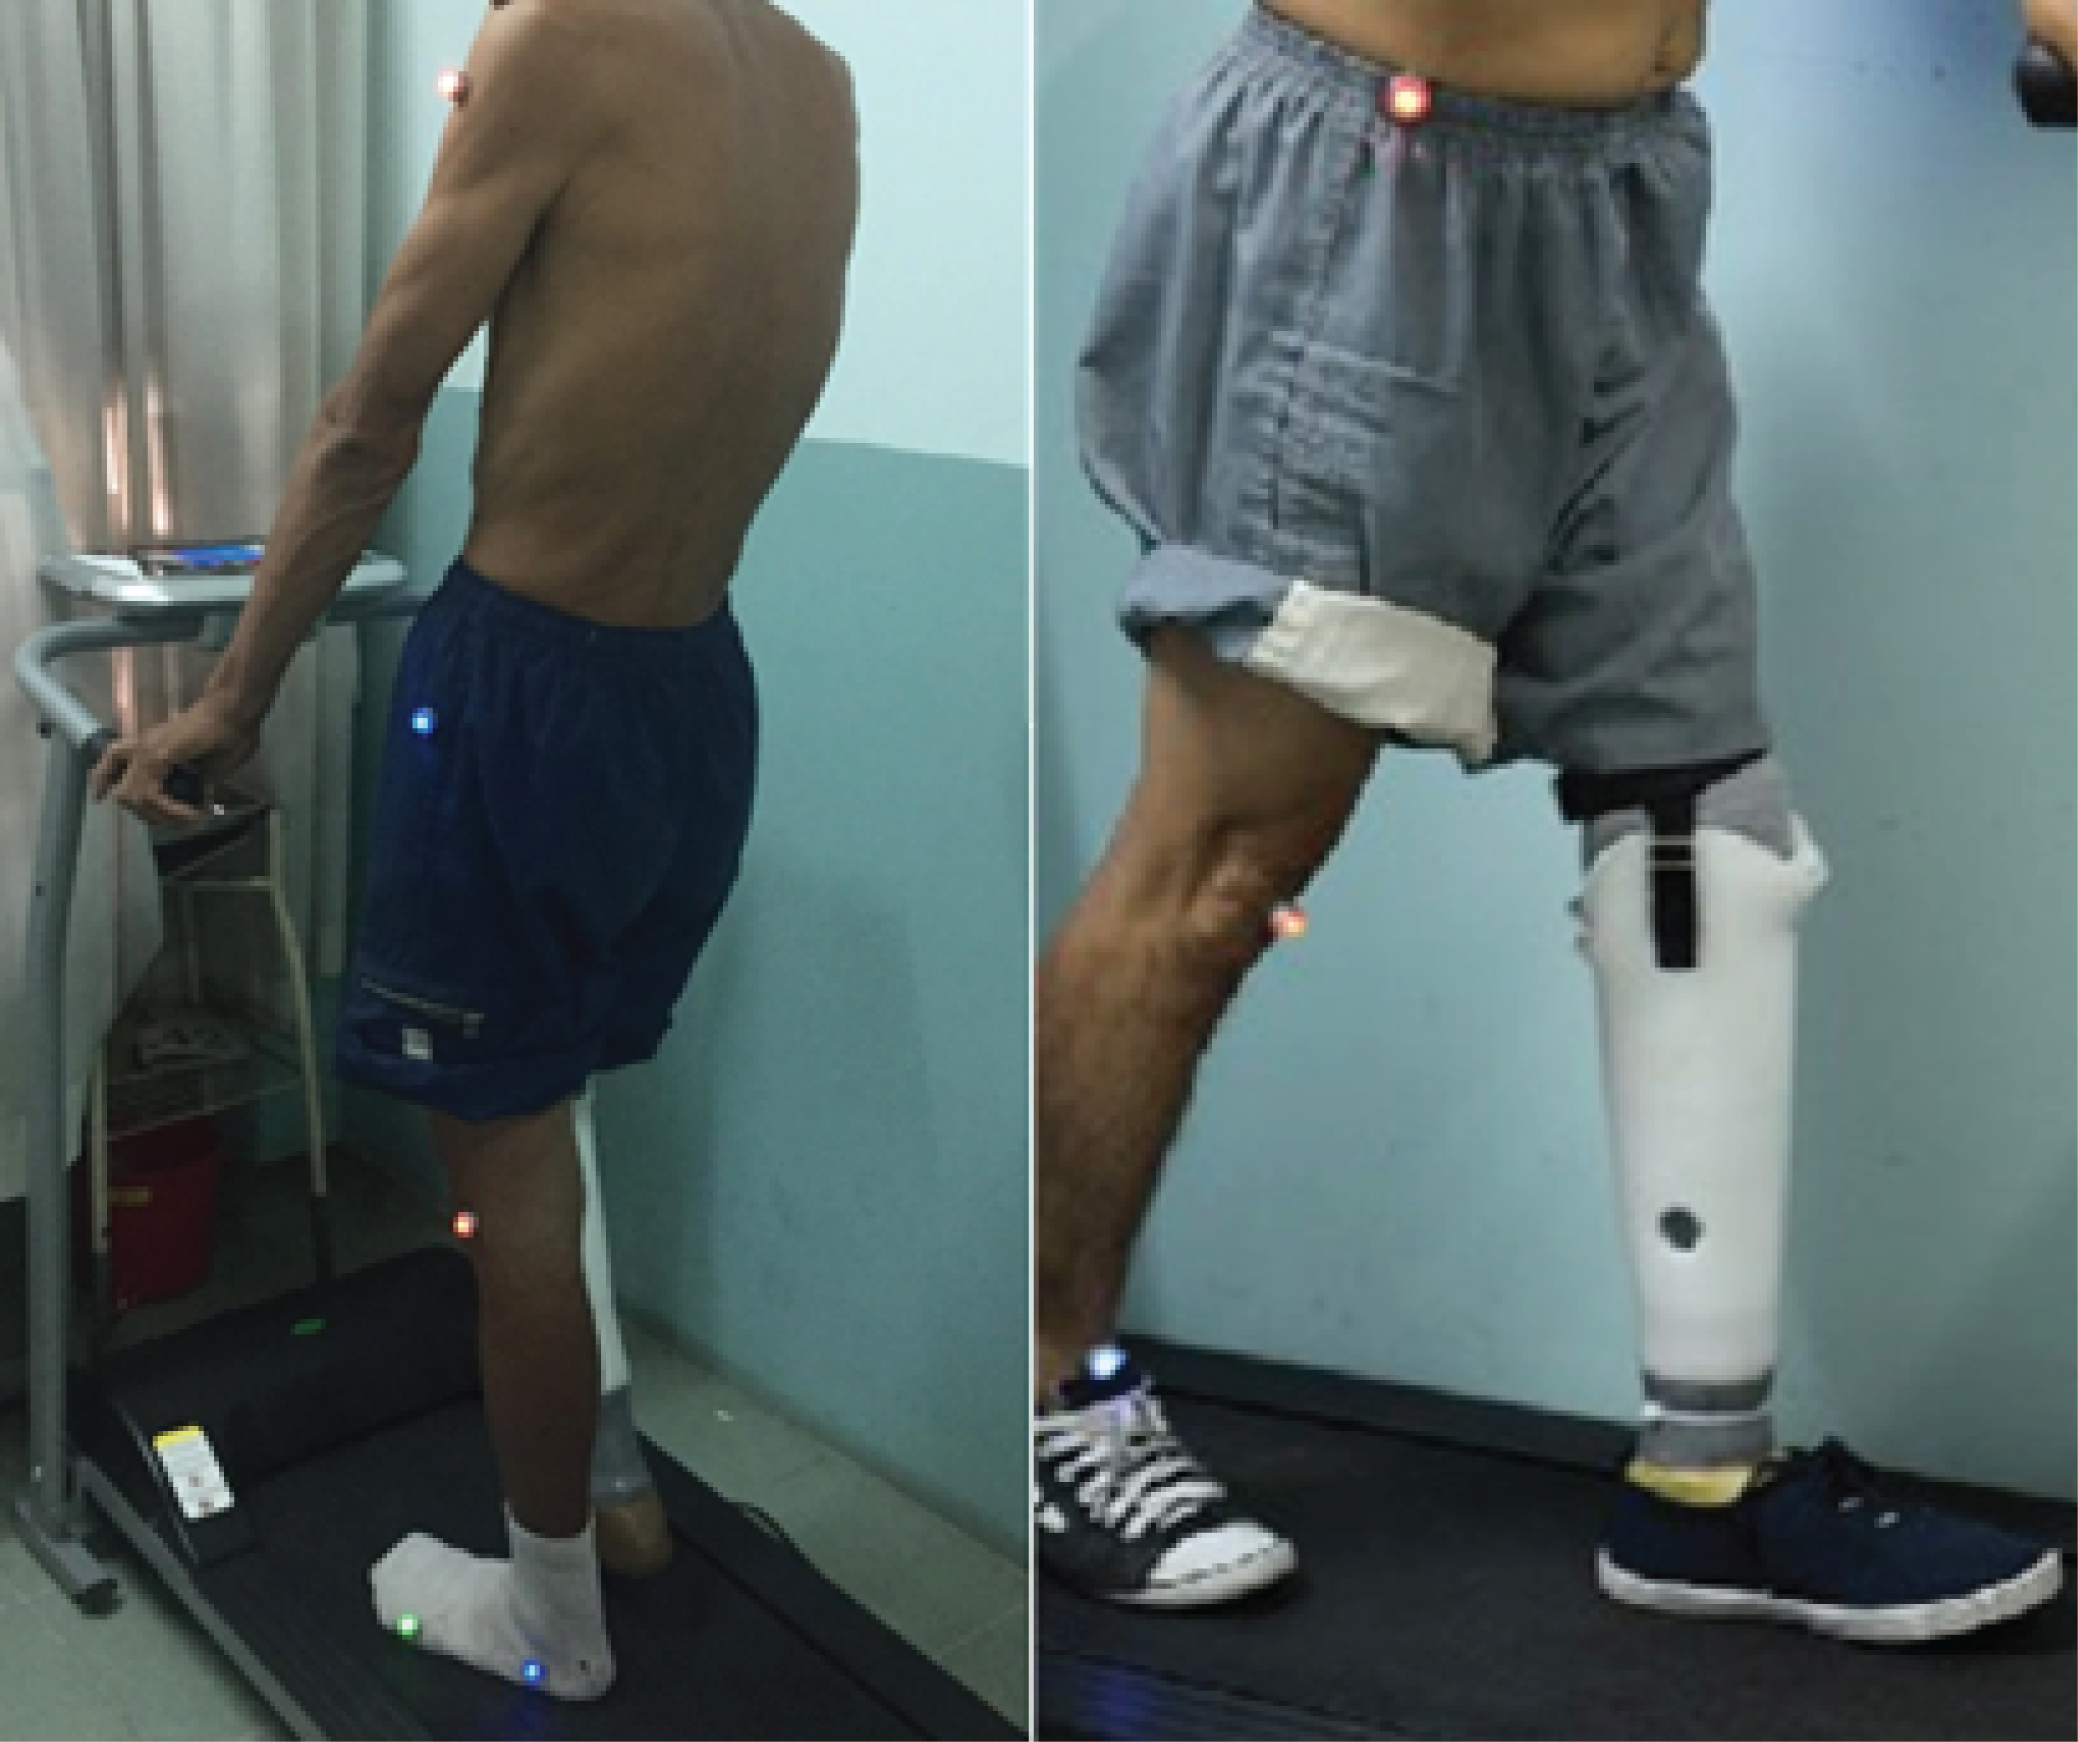 Figure 2.   Gait Motion Analysis Sensor Placement.  Left: Sagittal Left. Right: Sagittal Right.